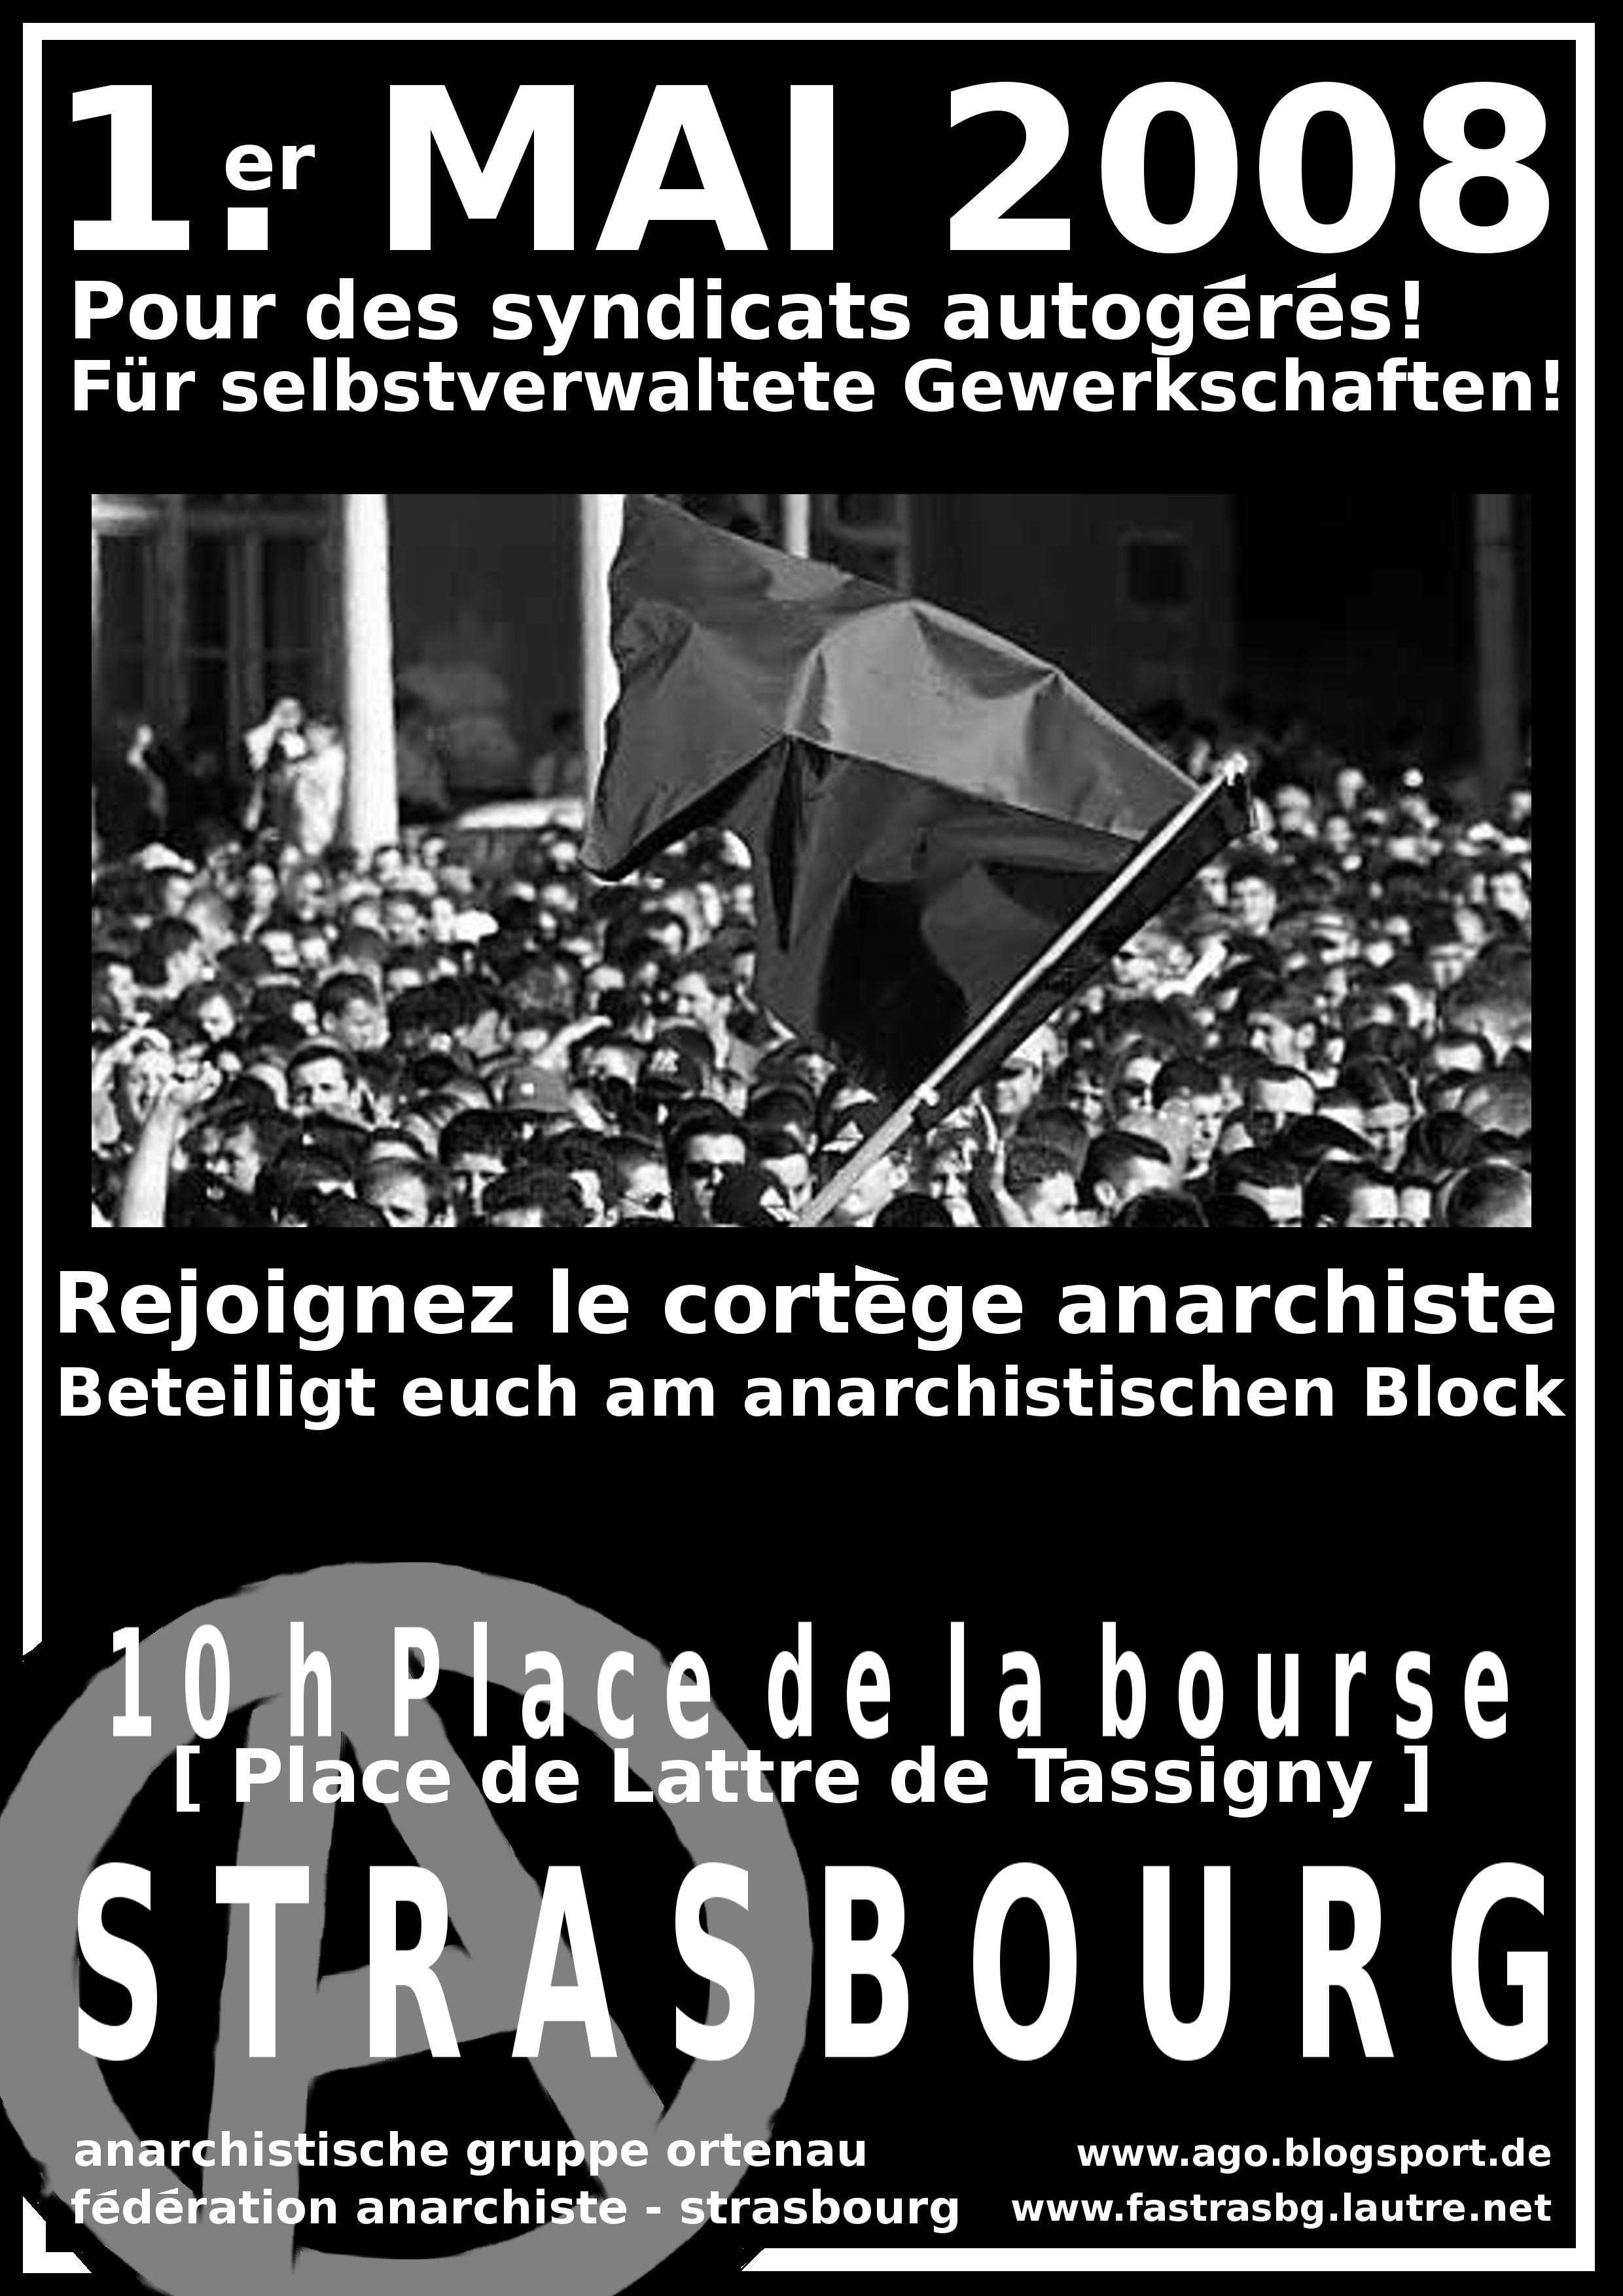 1. mai 2008 strasbourg